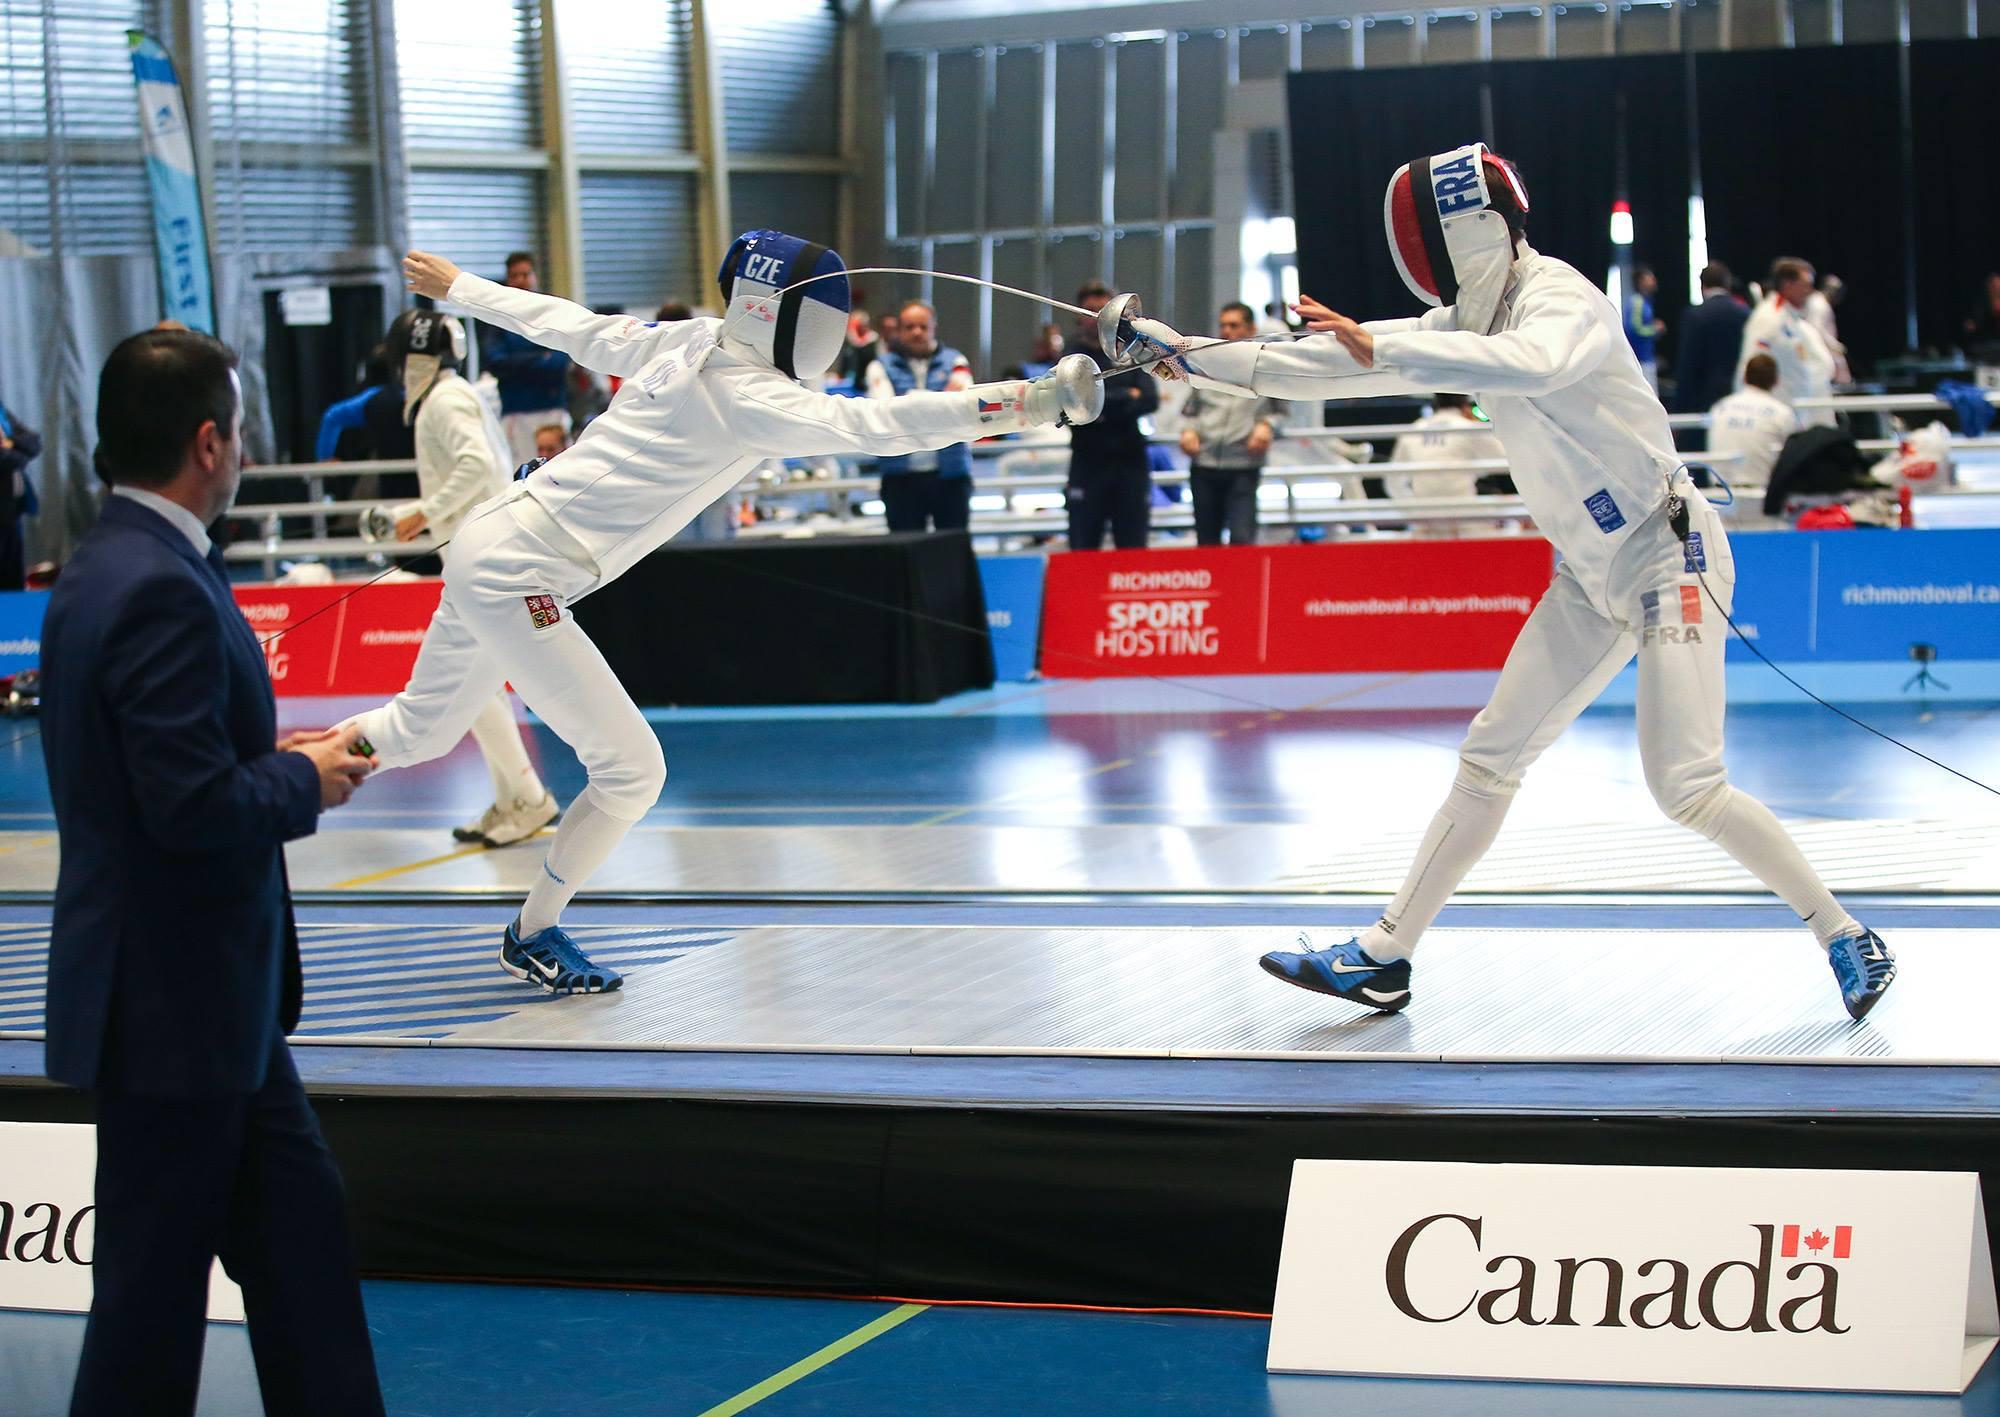 Competition also got underway at the FIE Men's Épée World Cup in Vancouver ©FIE/Facebook/Manky/Bizzi Team